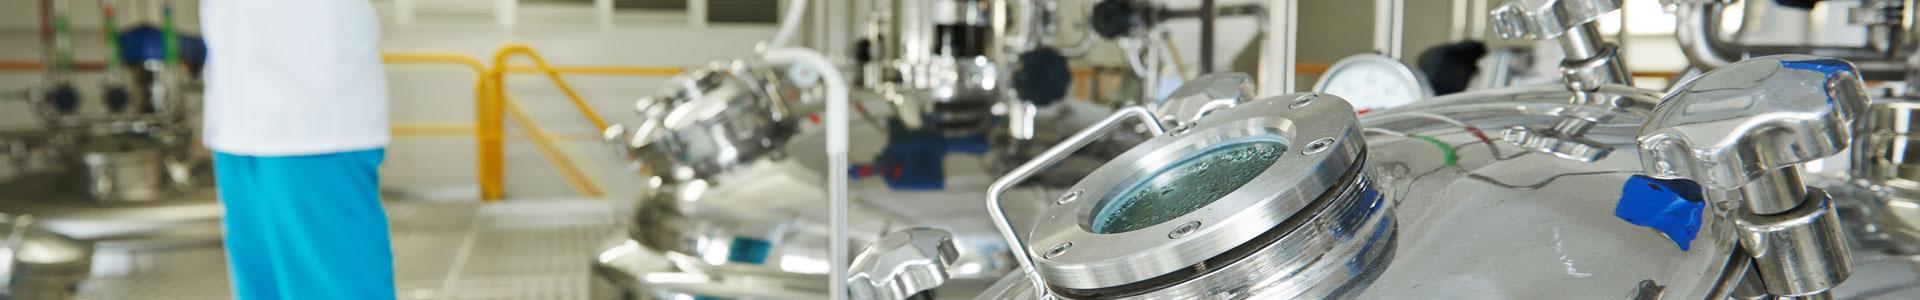 Pharmaceutical Equipment Facility